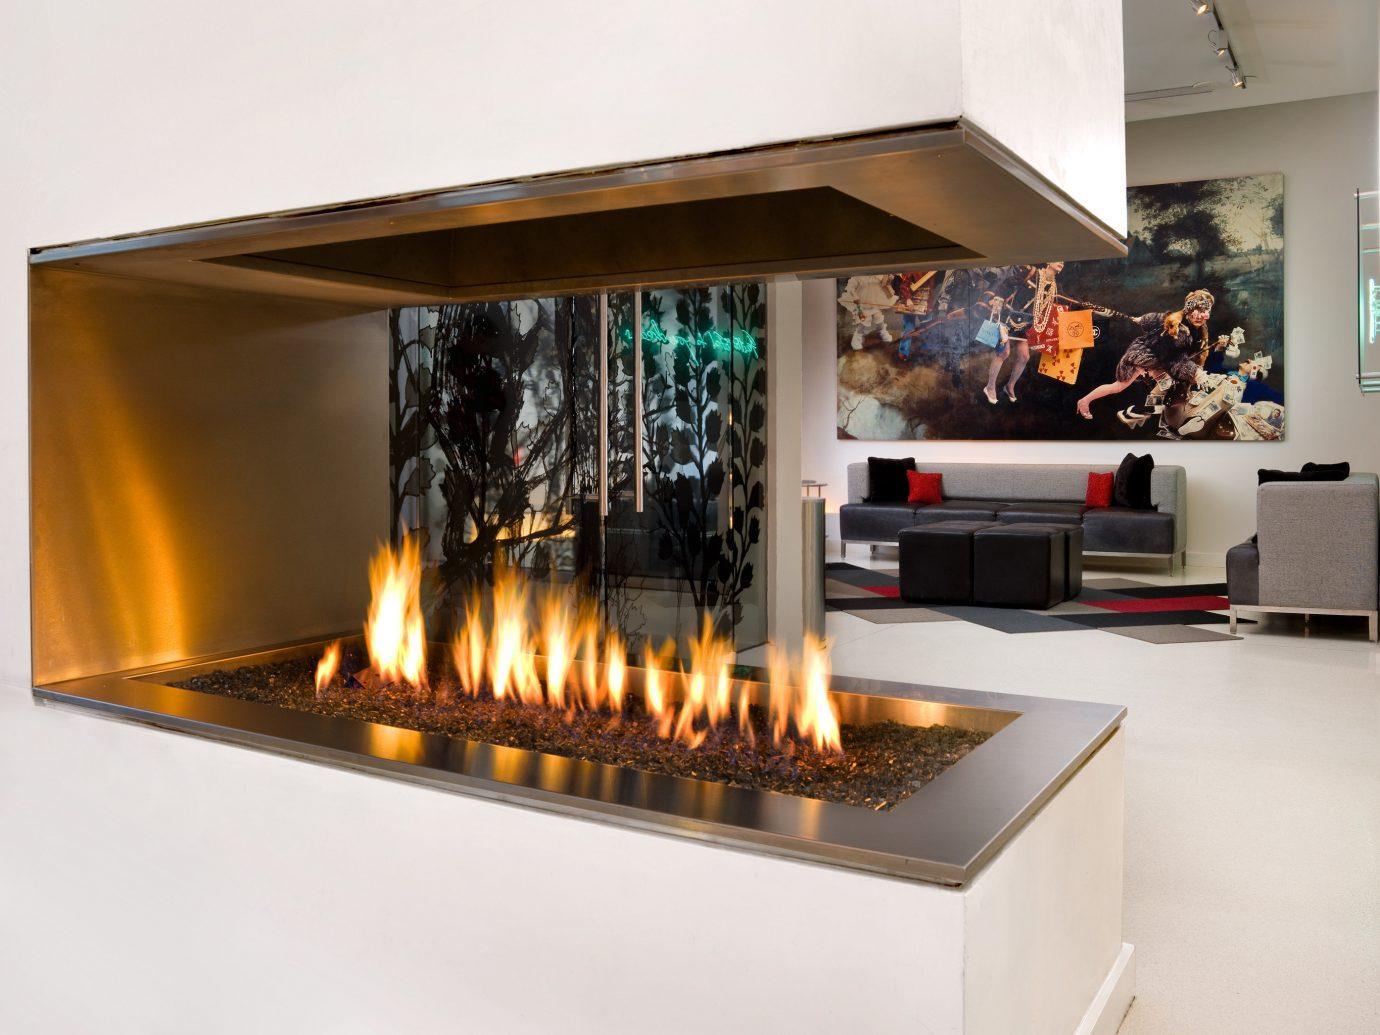 Budget Fireplace Hip Living Lounge Modern indoor hearth room home interior design counter living room Design light cooking